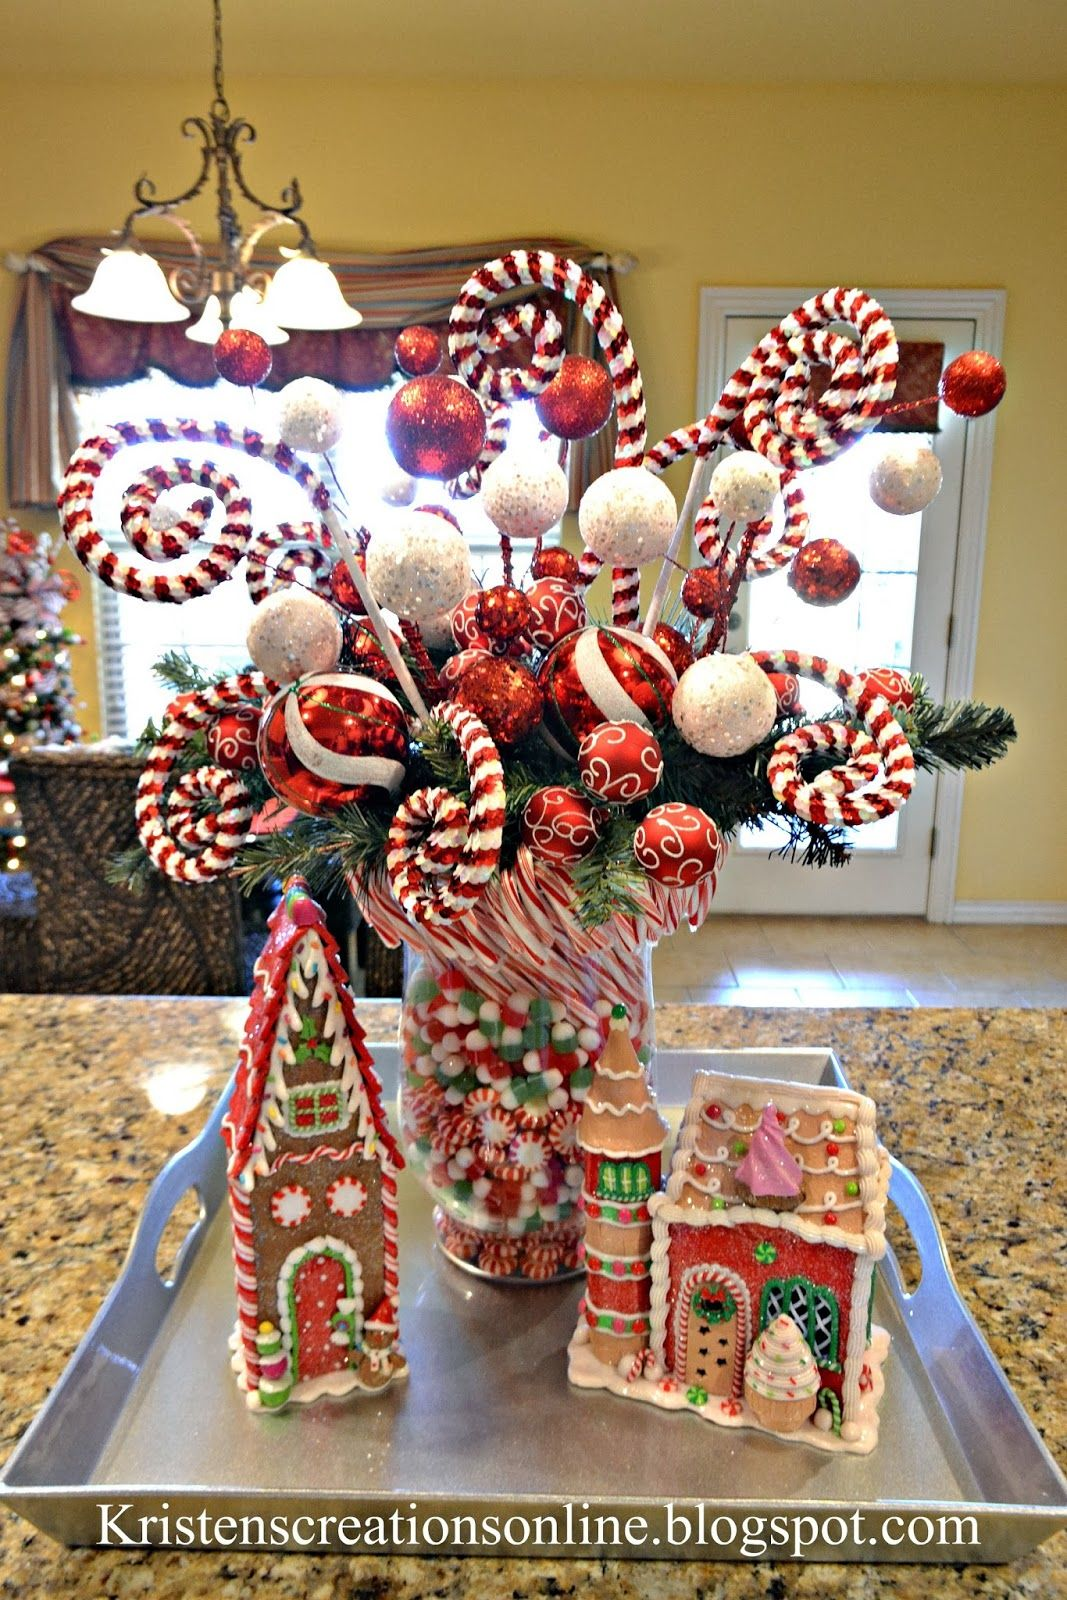 Candy2 Jpg 1 067 1 600 Pixels Gingerbread Christmas Decor Merry Christmas Everyone Rustic Christmas